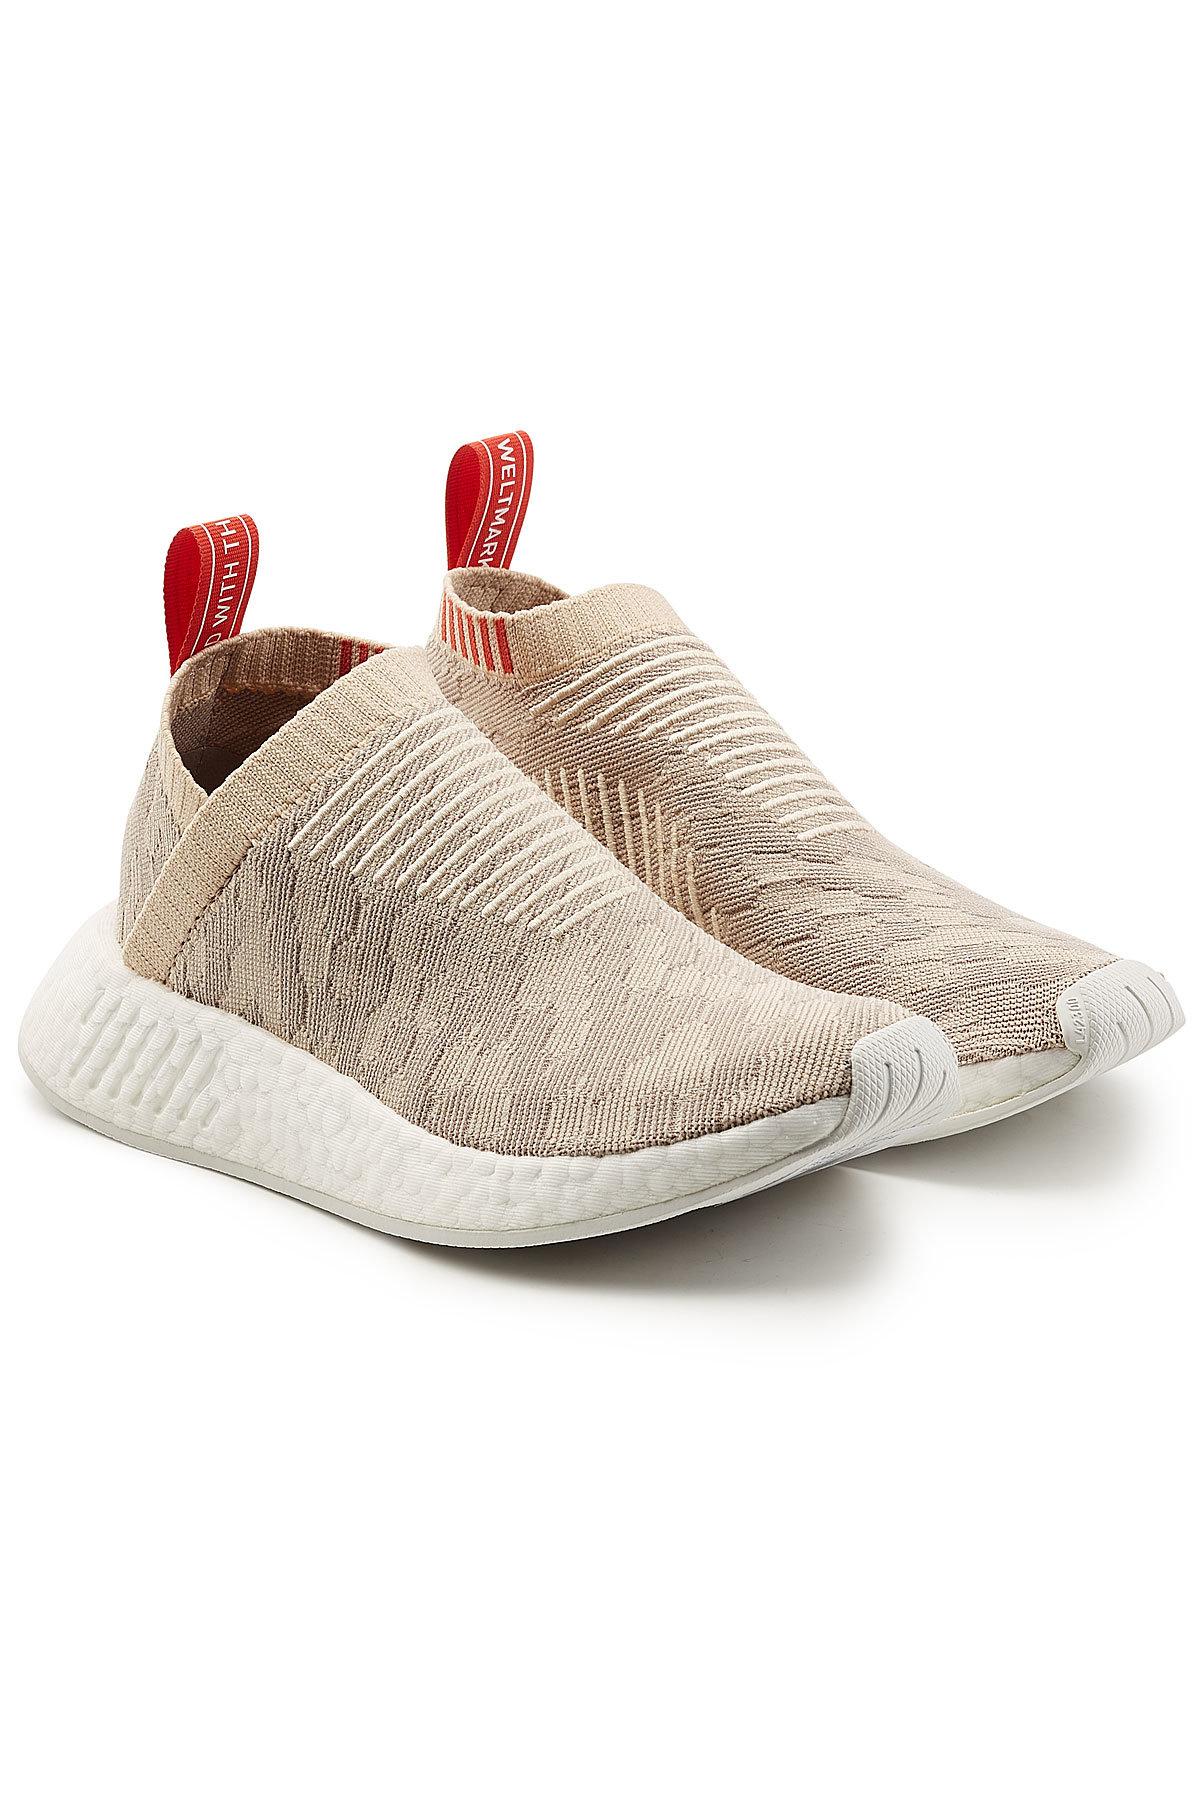 adidas NMD_CS2 Primeknit Sneakers Gr. UK 4 kZODTJR